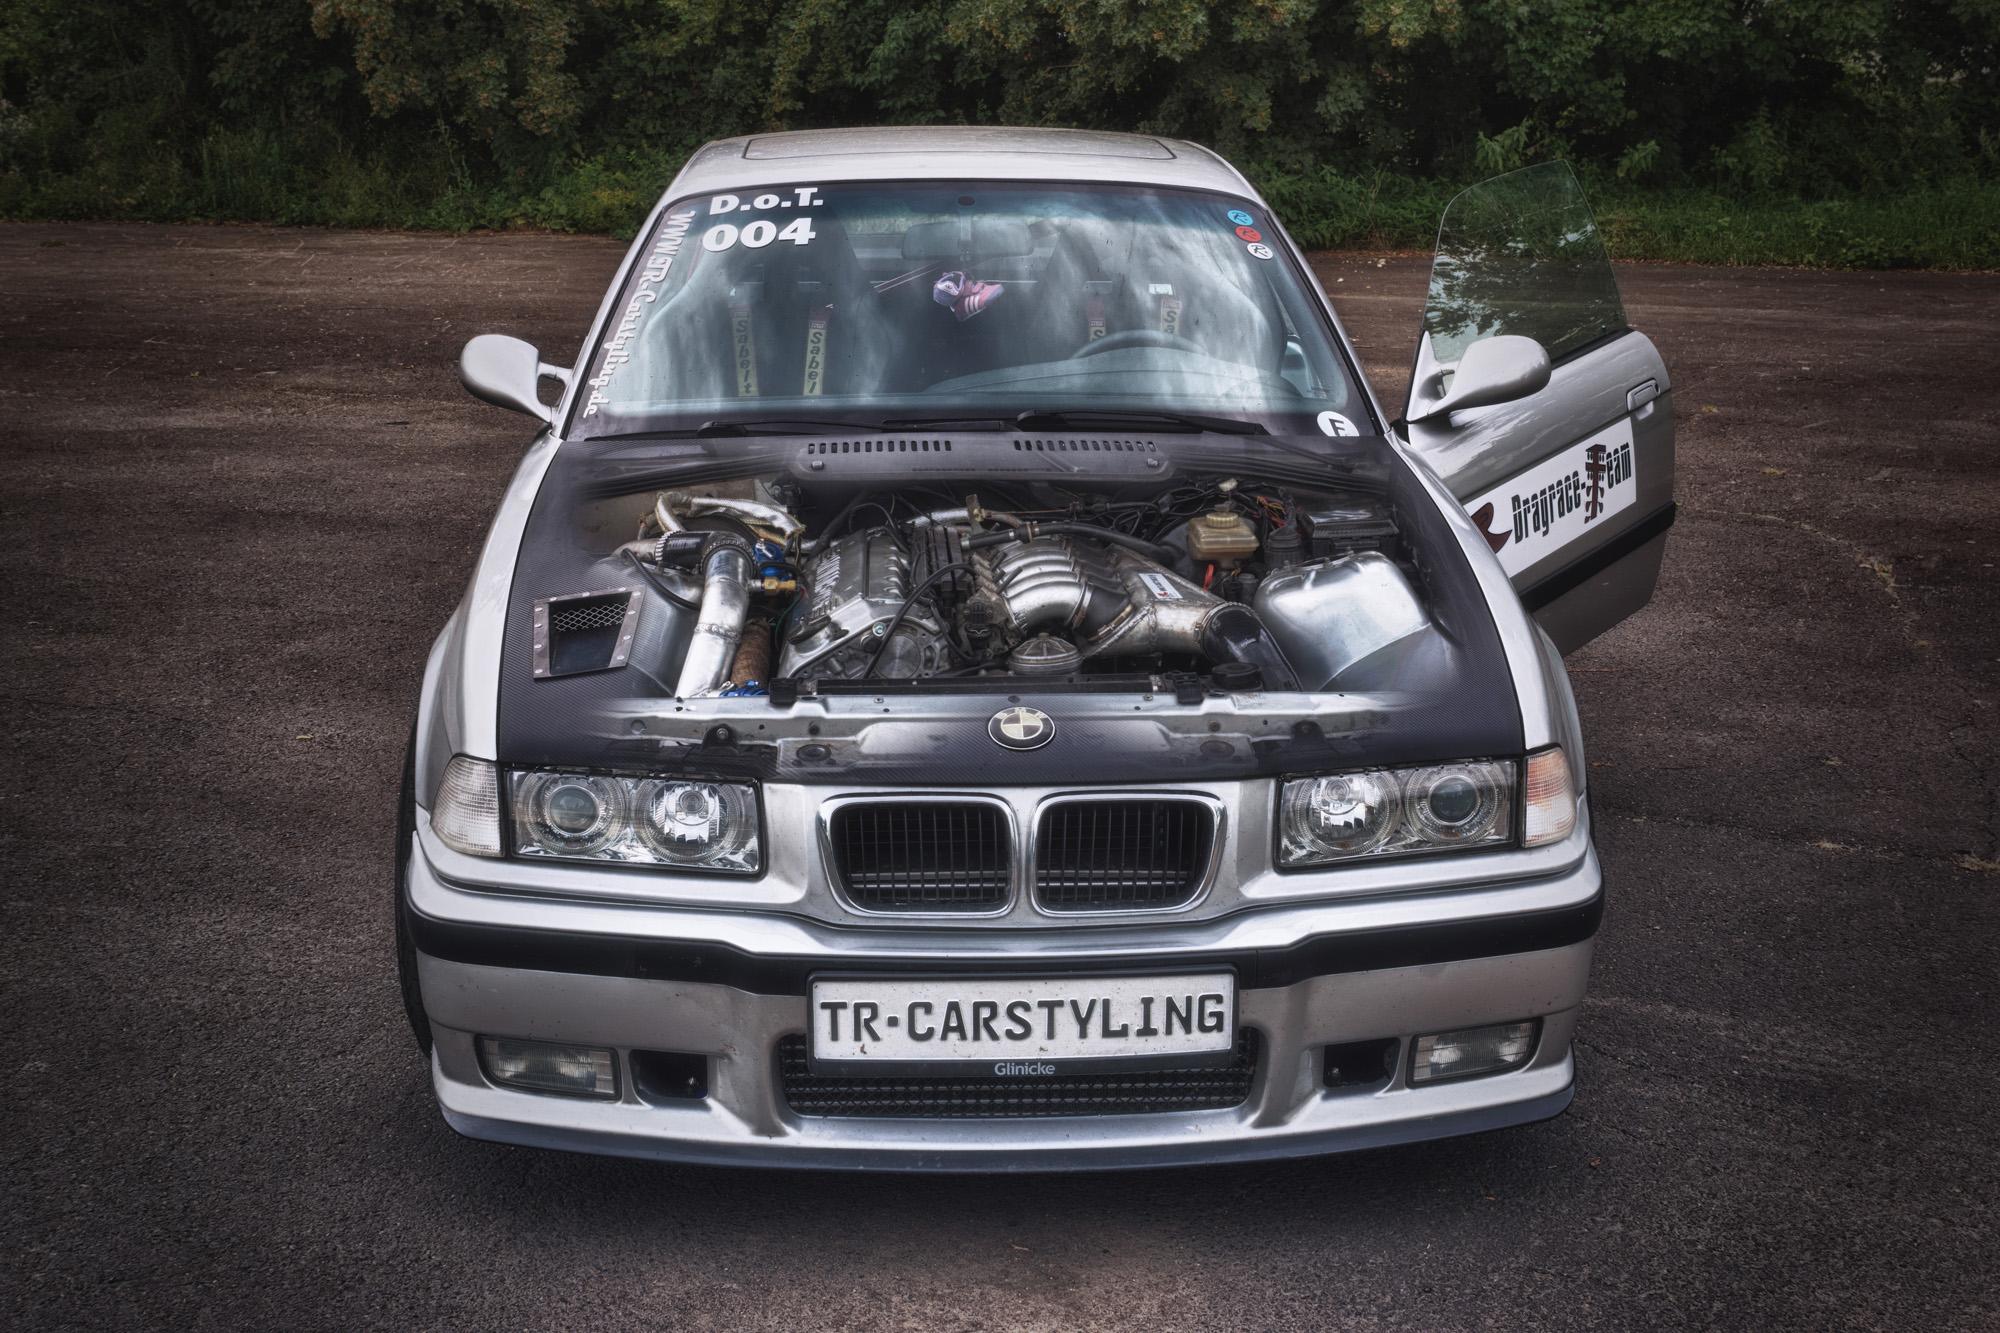 bmw-m3-e36-turbo-tr-carstyling-03